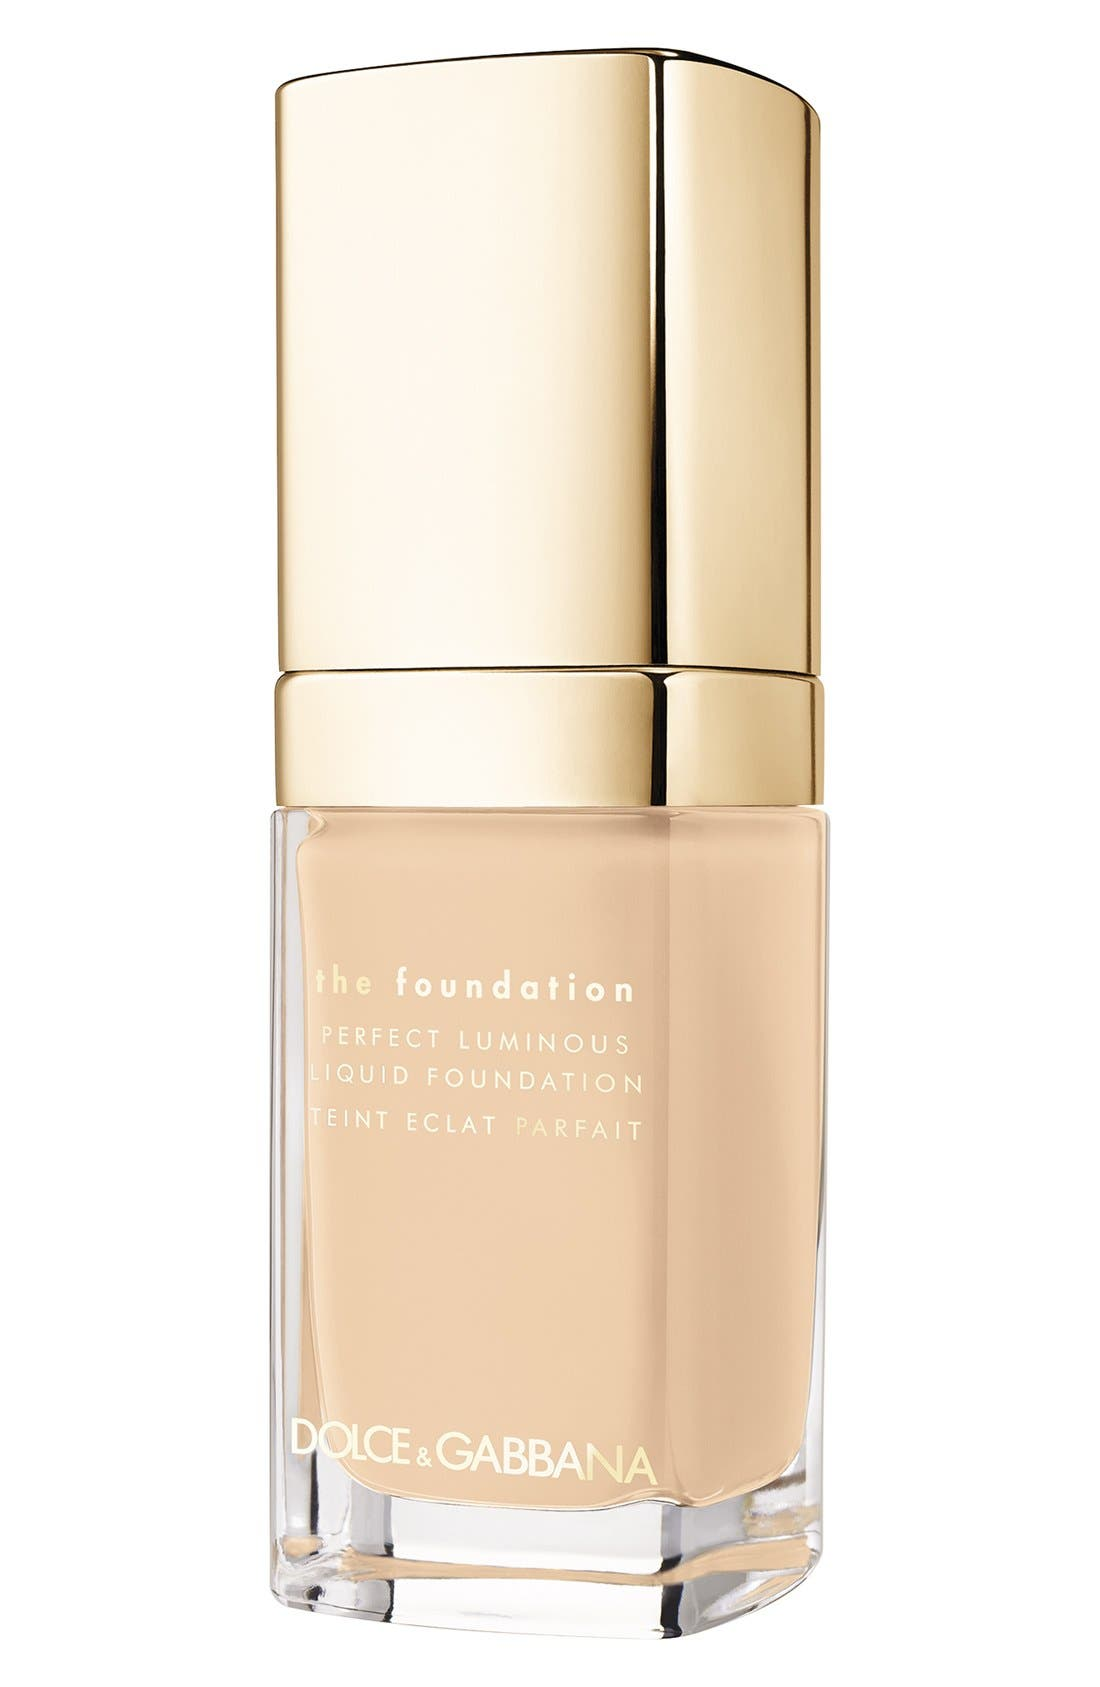 Dolce&Gabbana Beauty Perfect Luminous Liquid Foundation